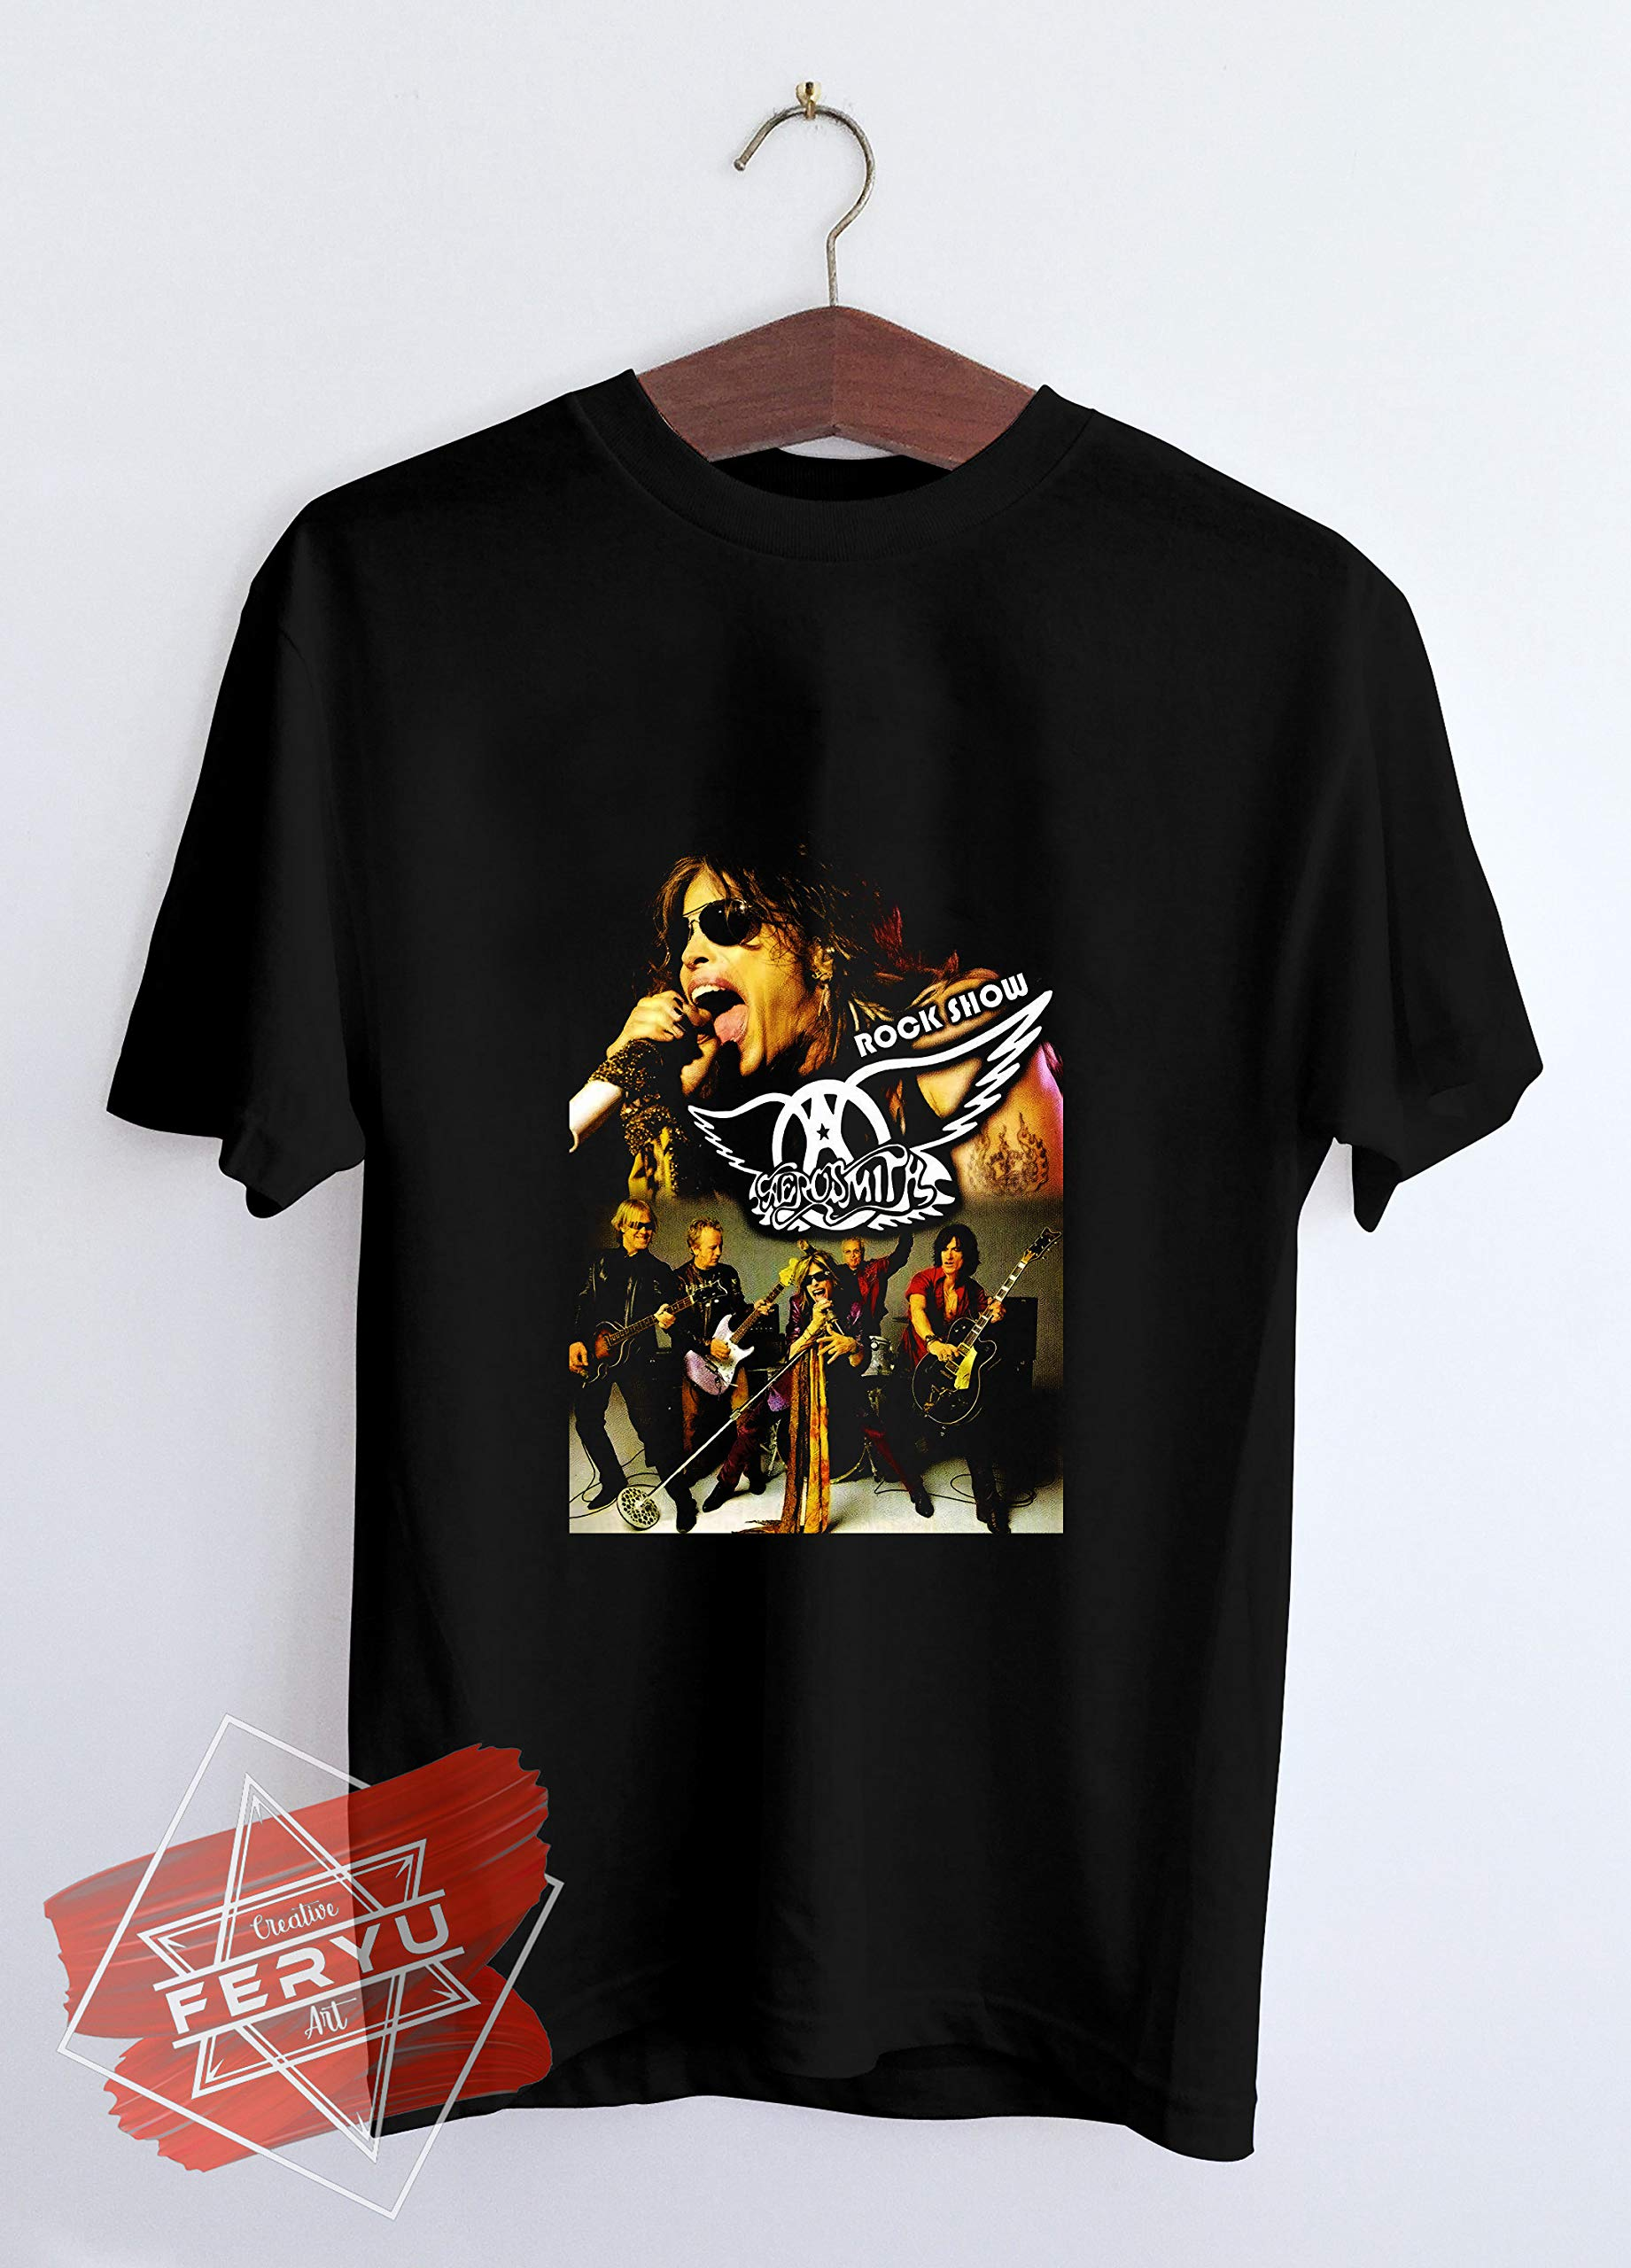 Aerosmith Concert, Aerosmith Band Hypebeast Sreet Wear For Adult Unisex Shirts